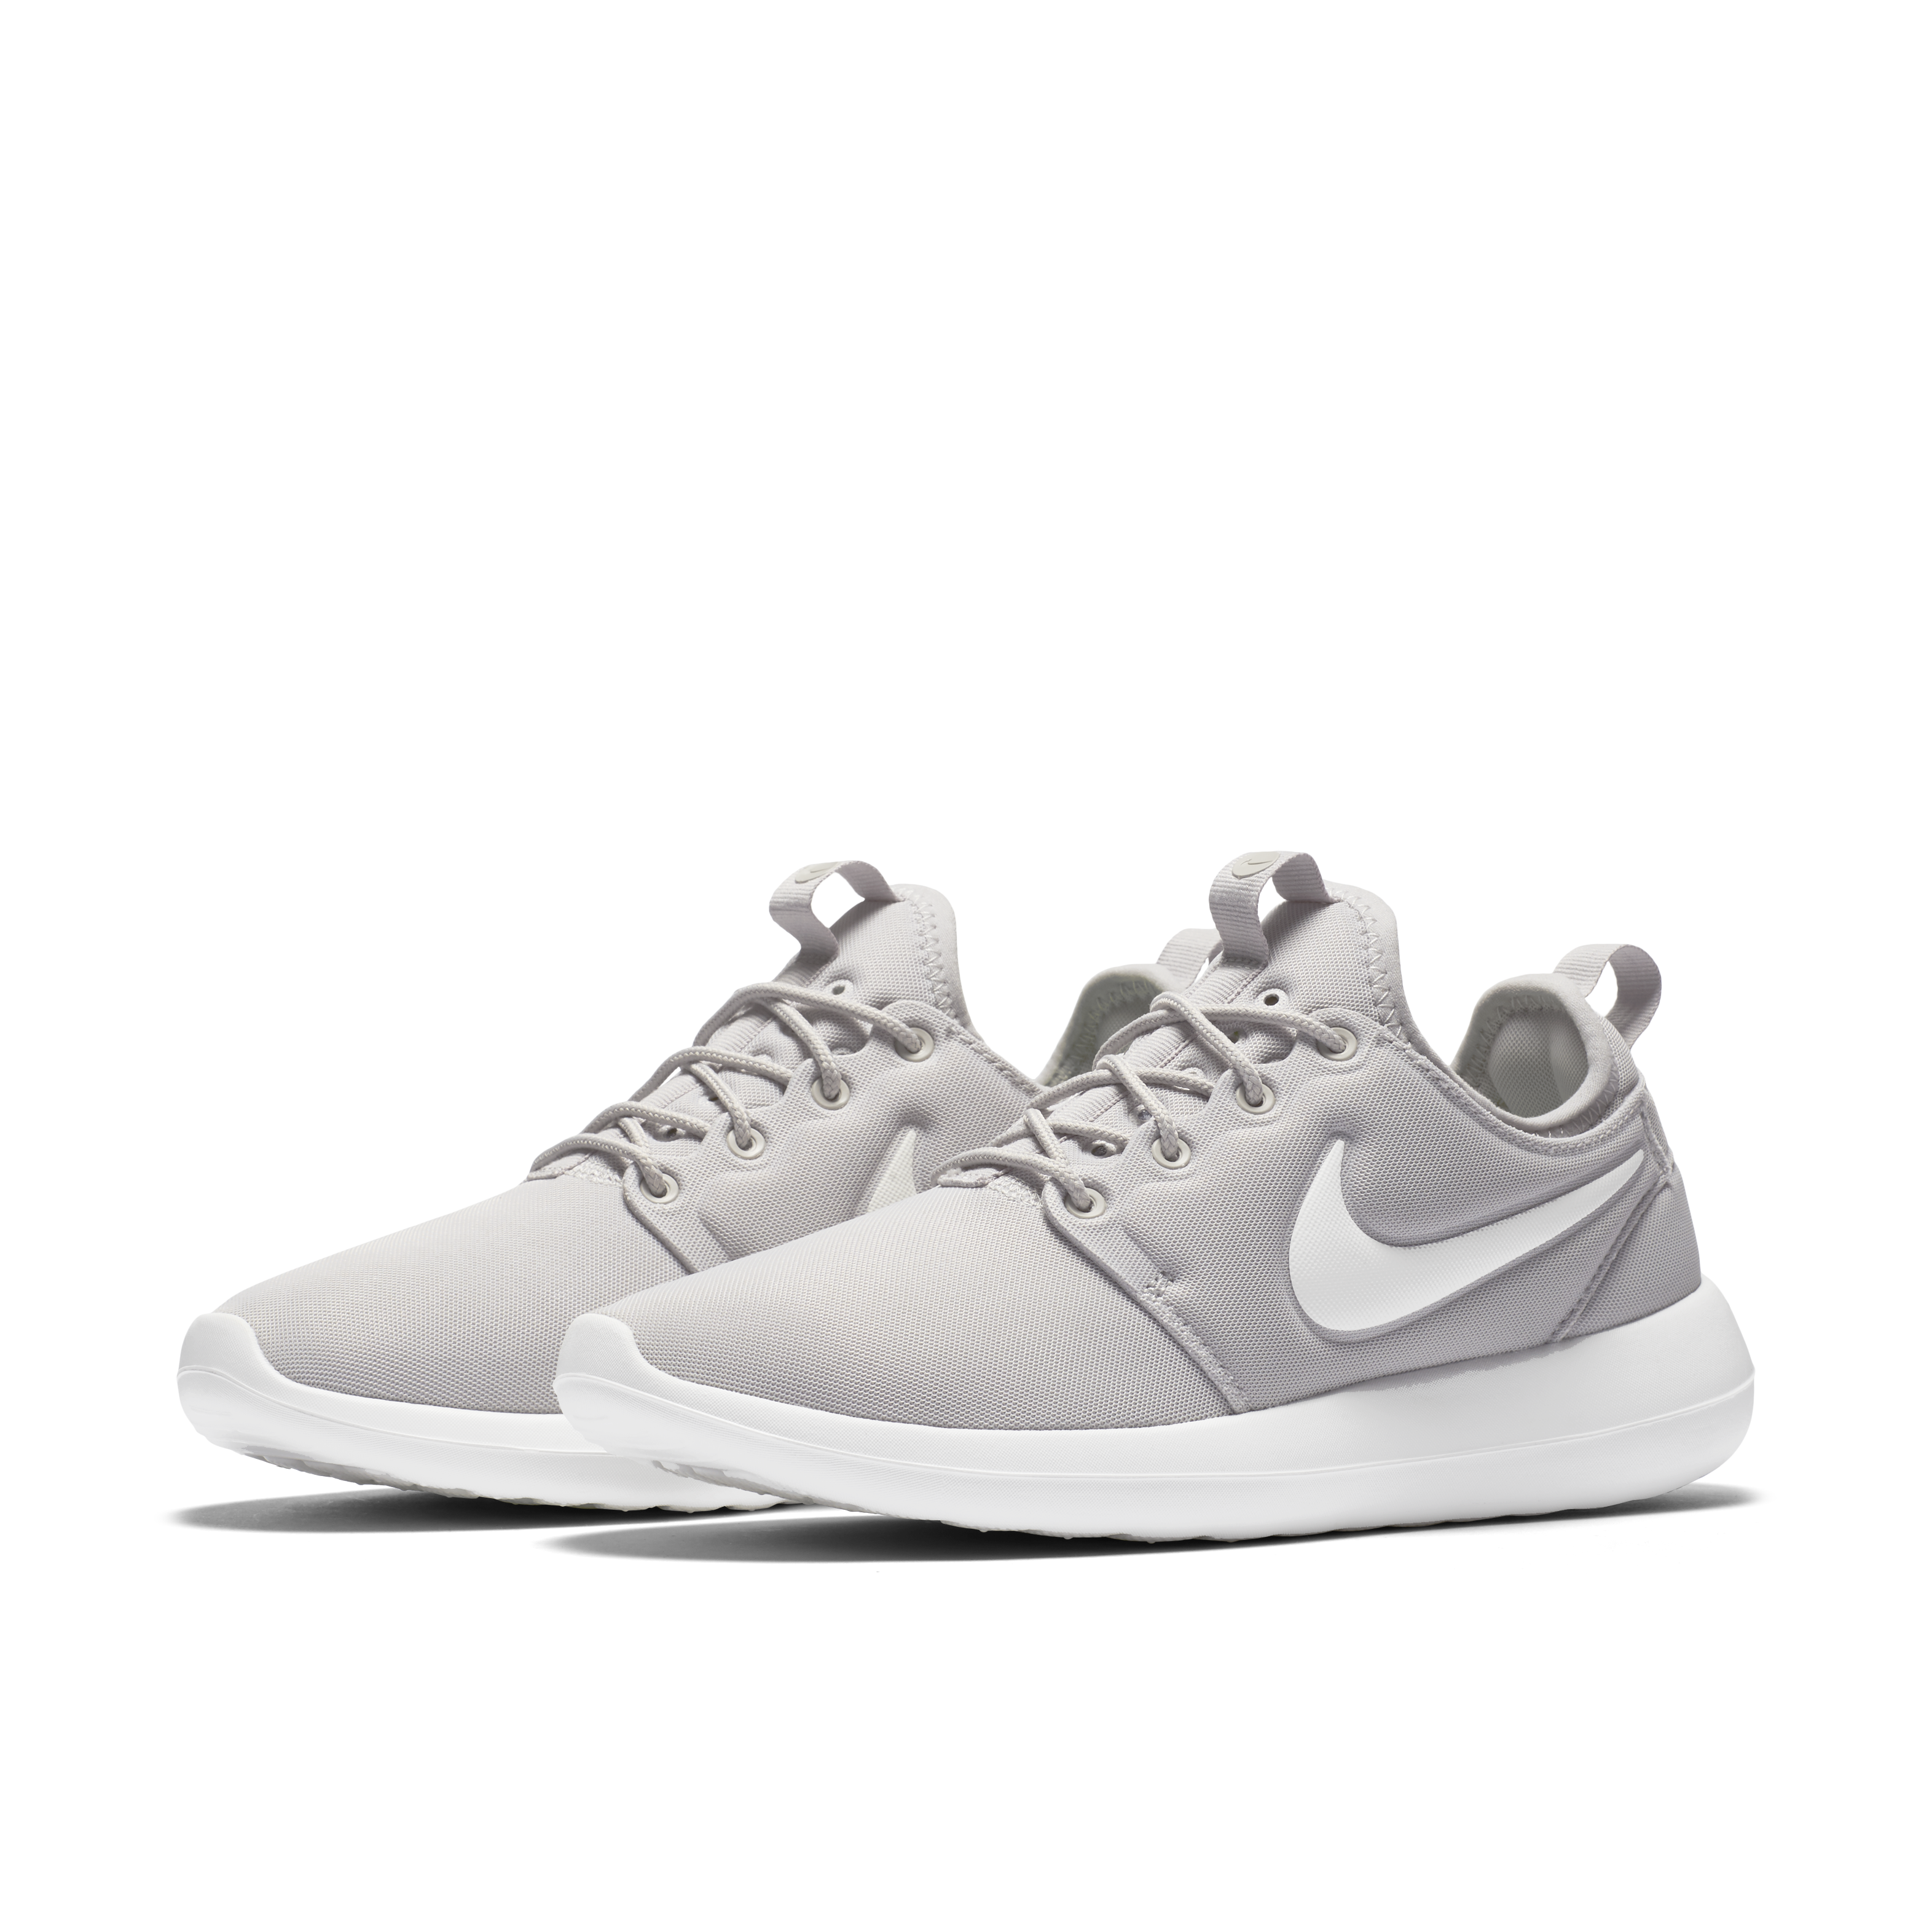 Nike Roshe Two. Download Image: LO · HI